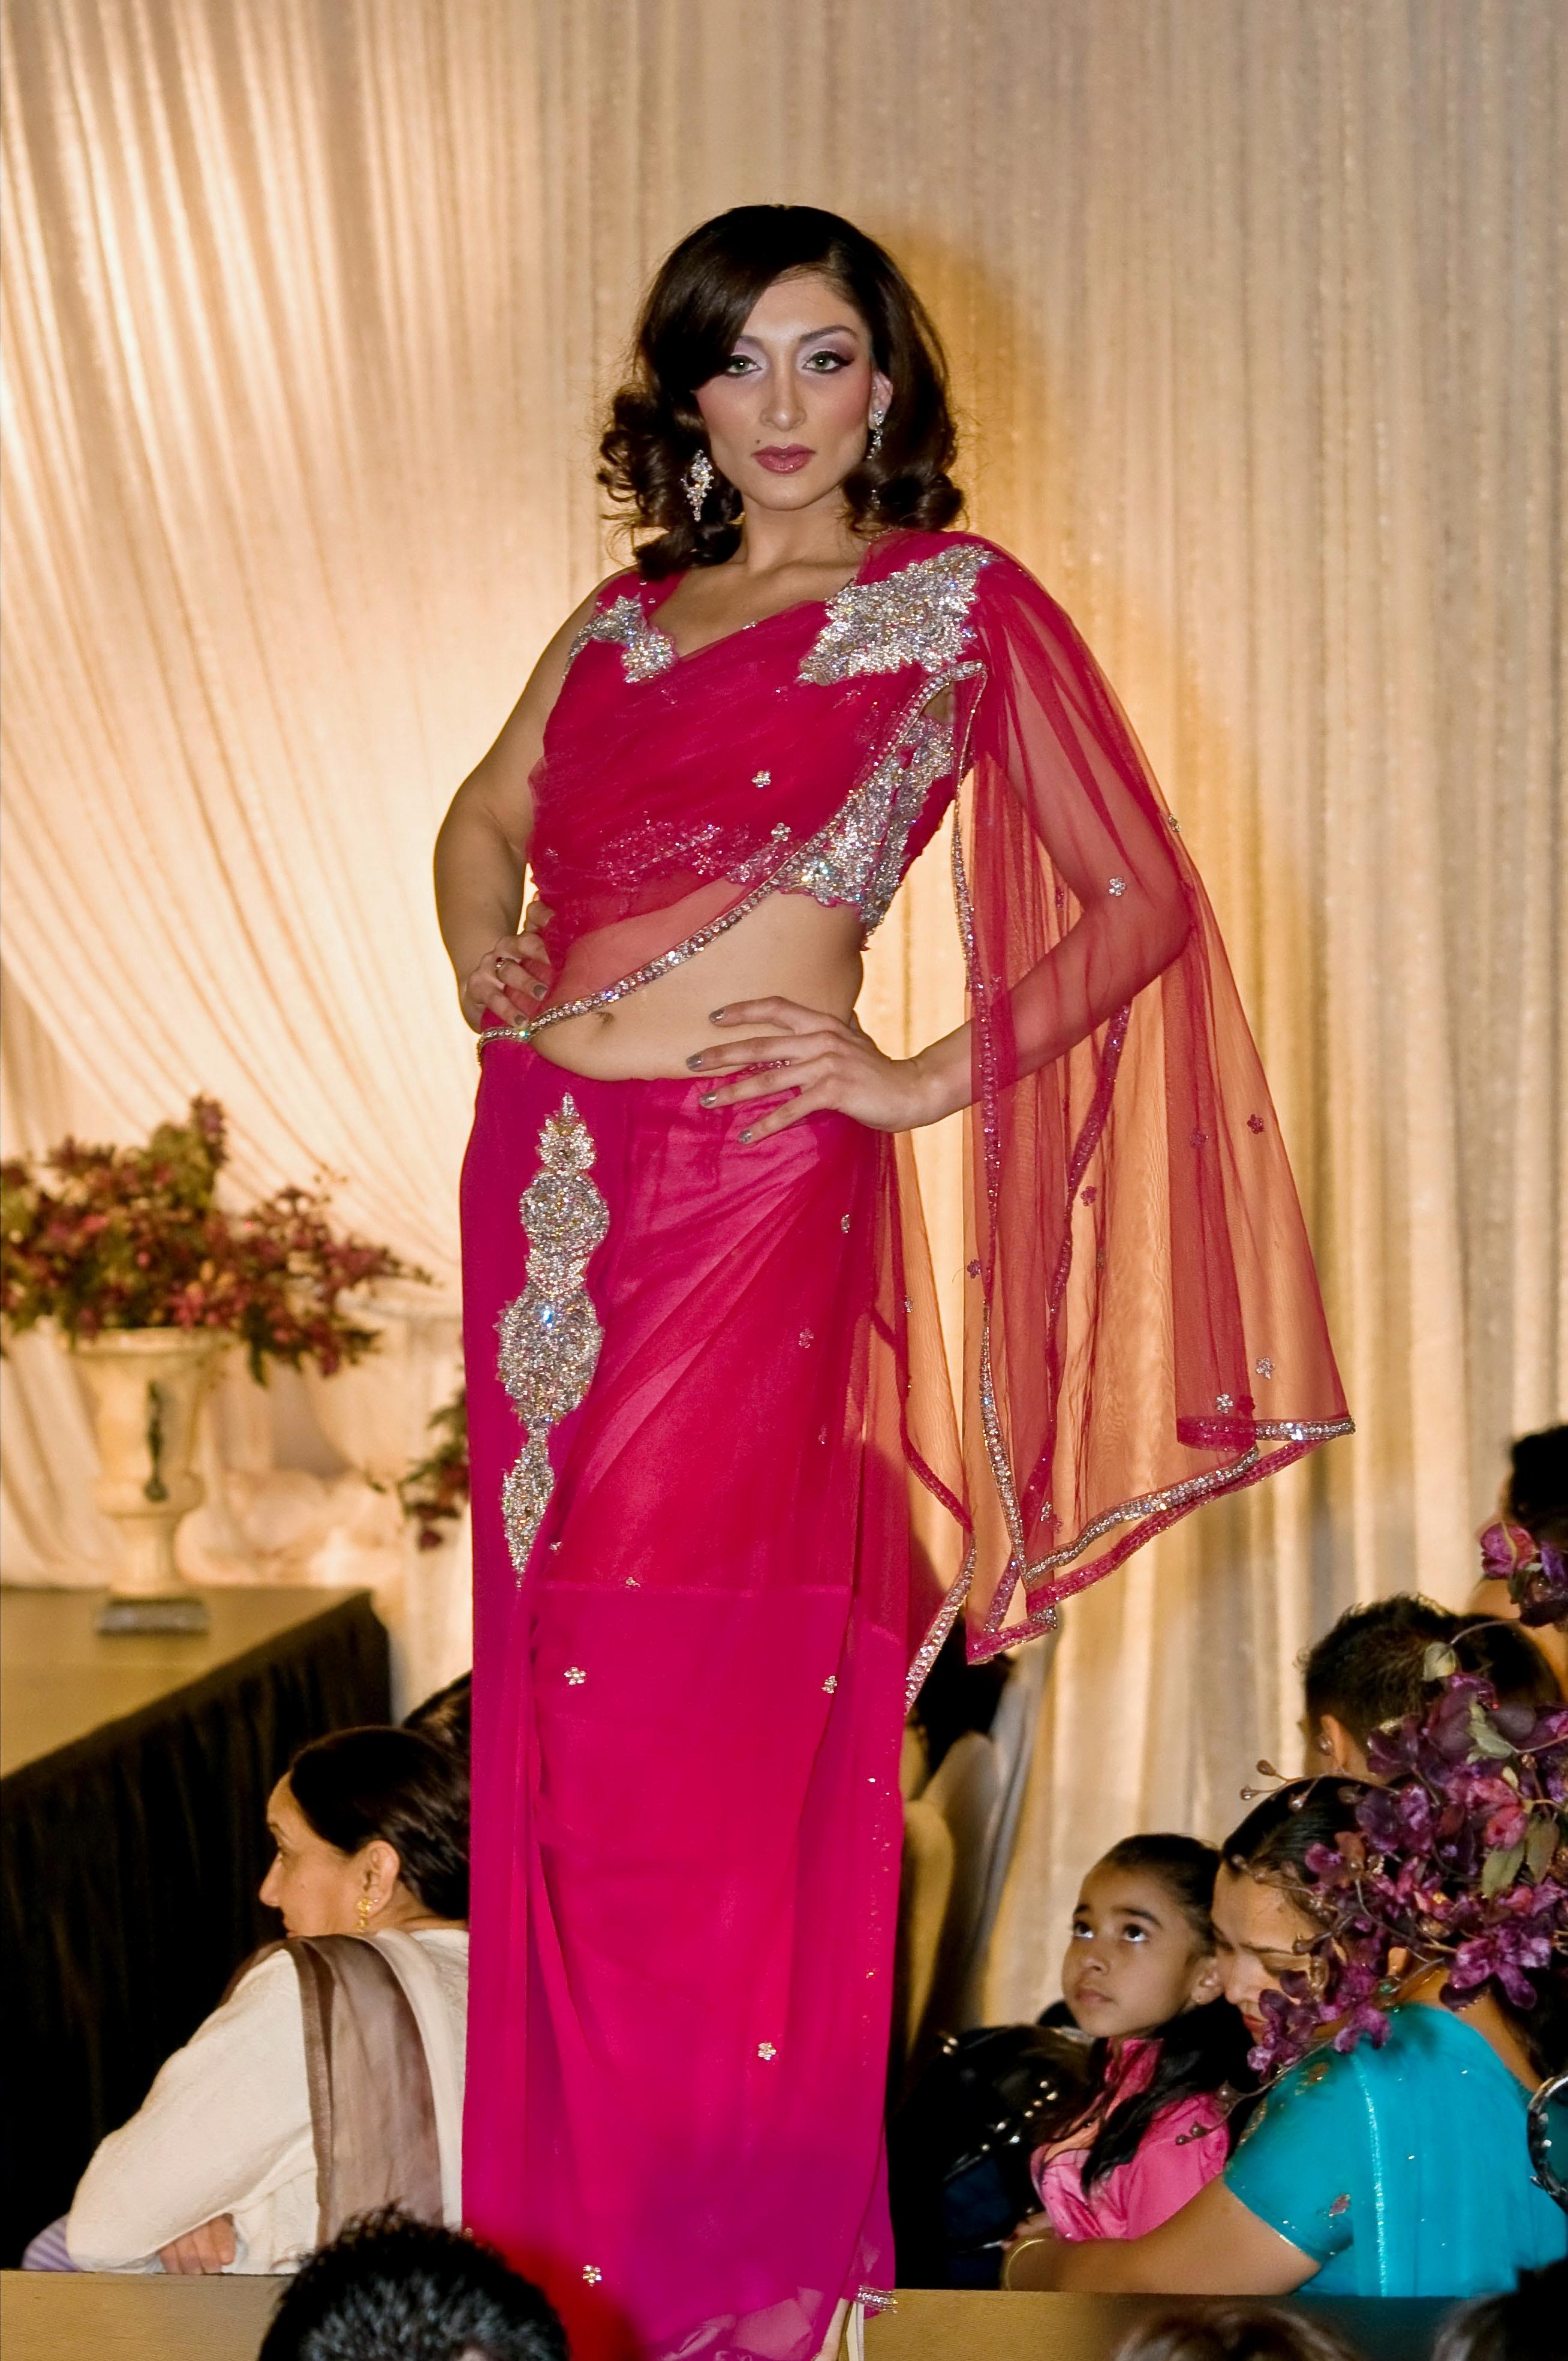 Description Female Model in Navel exposing Sari.jpg